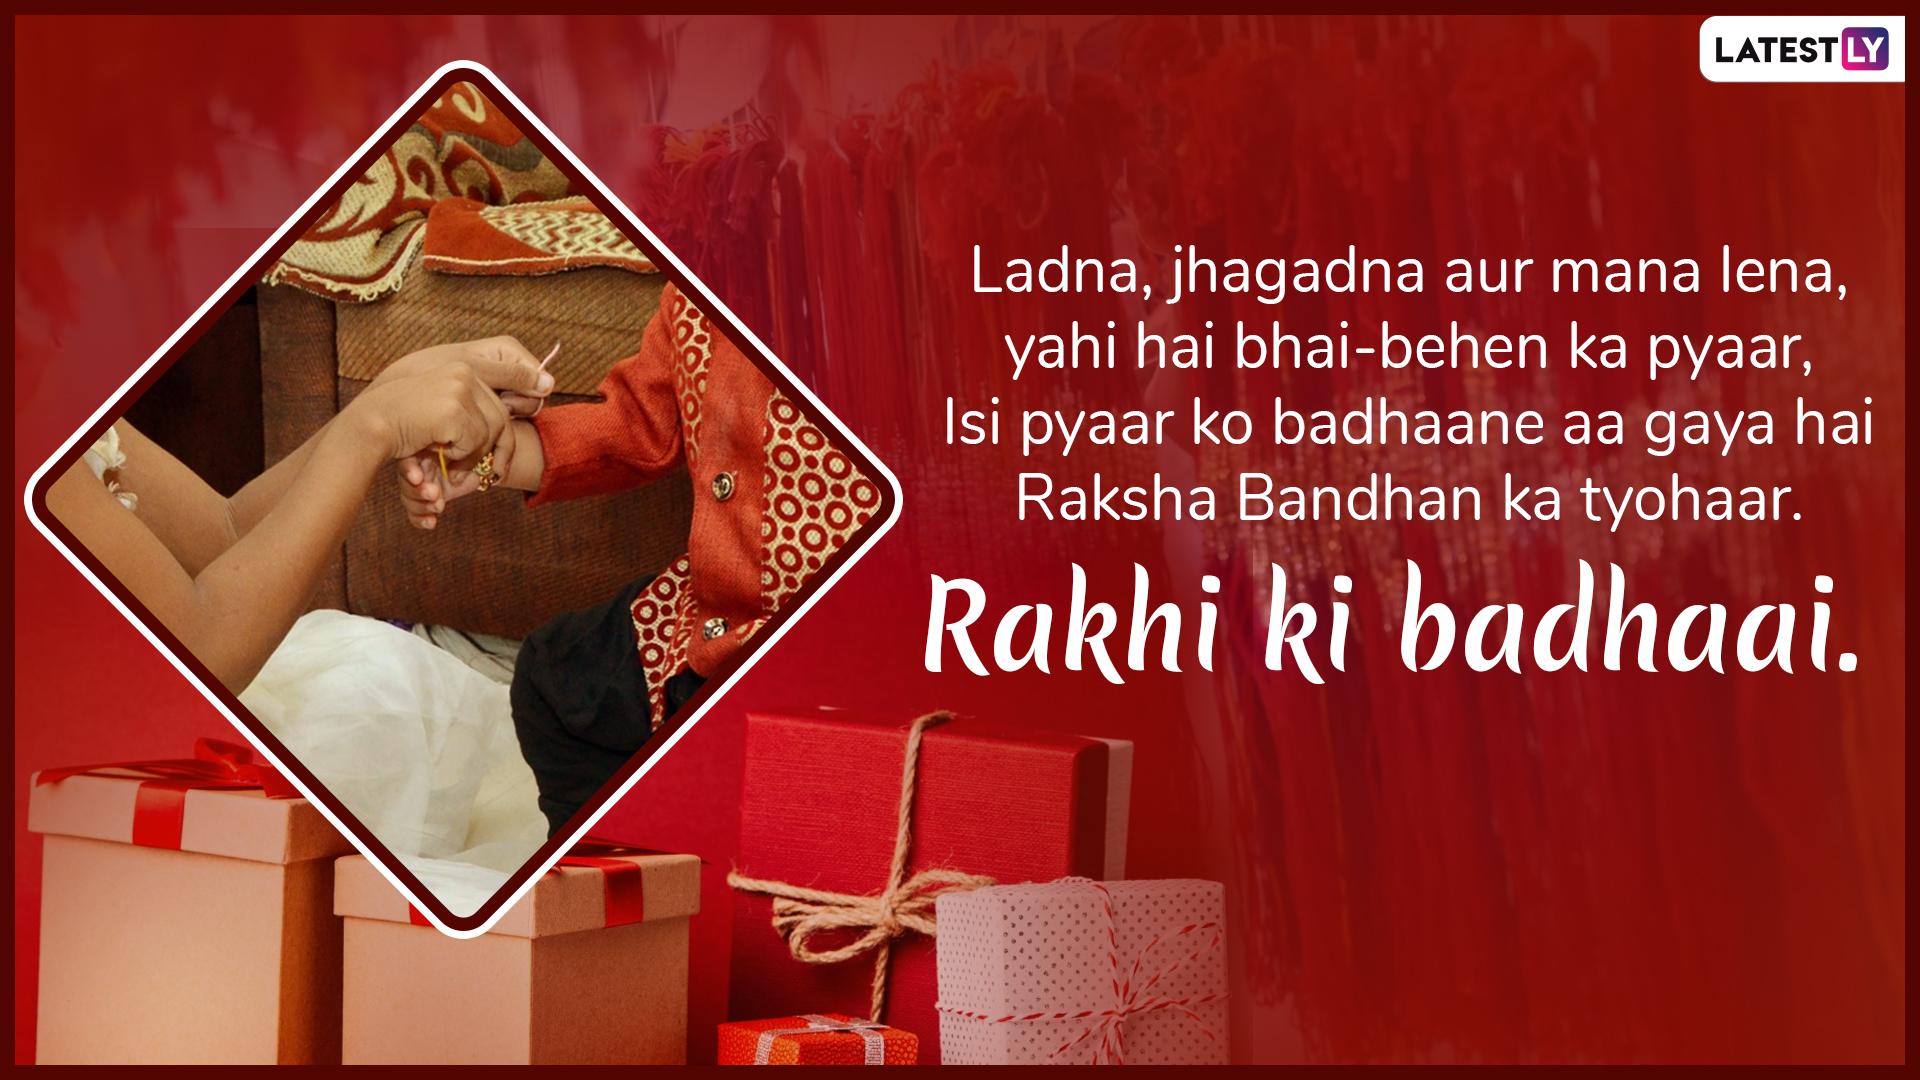 Raksha Bandhan 2019 greeting card for download 4 (Photo credits: File image)